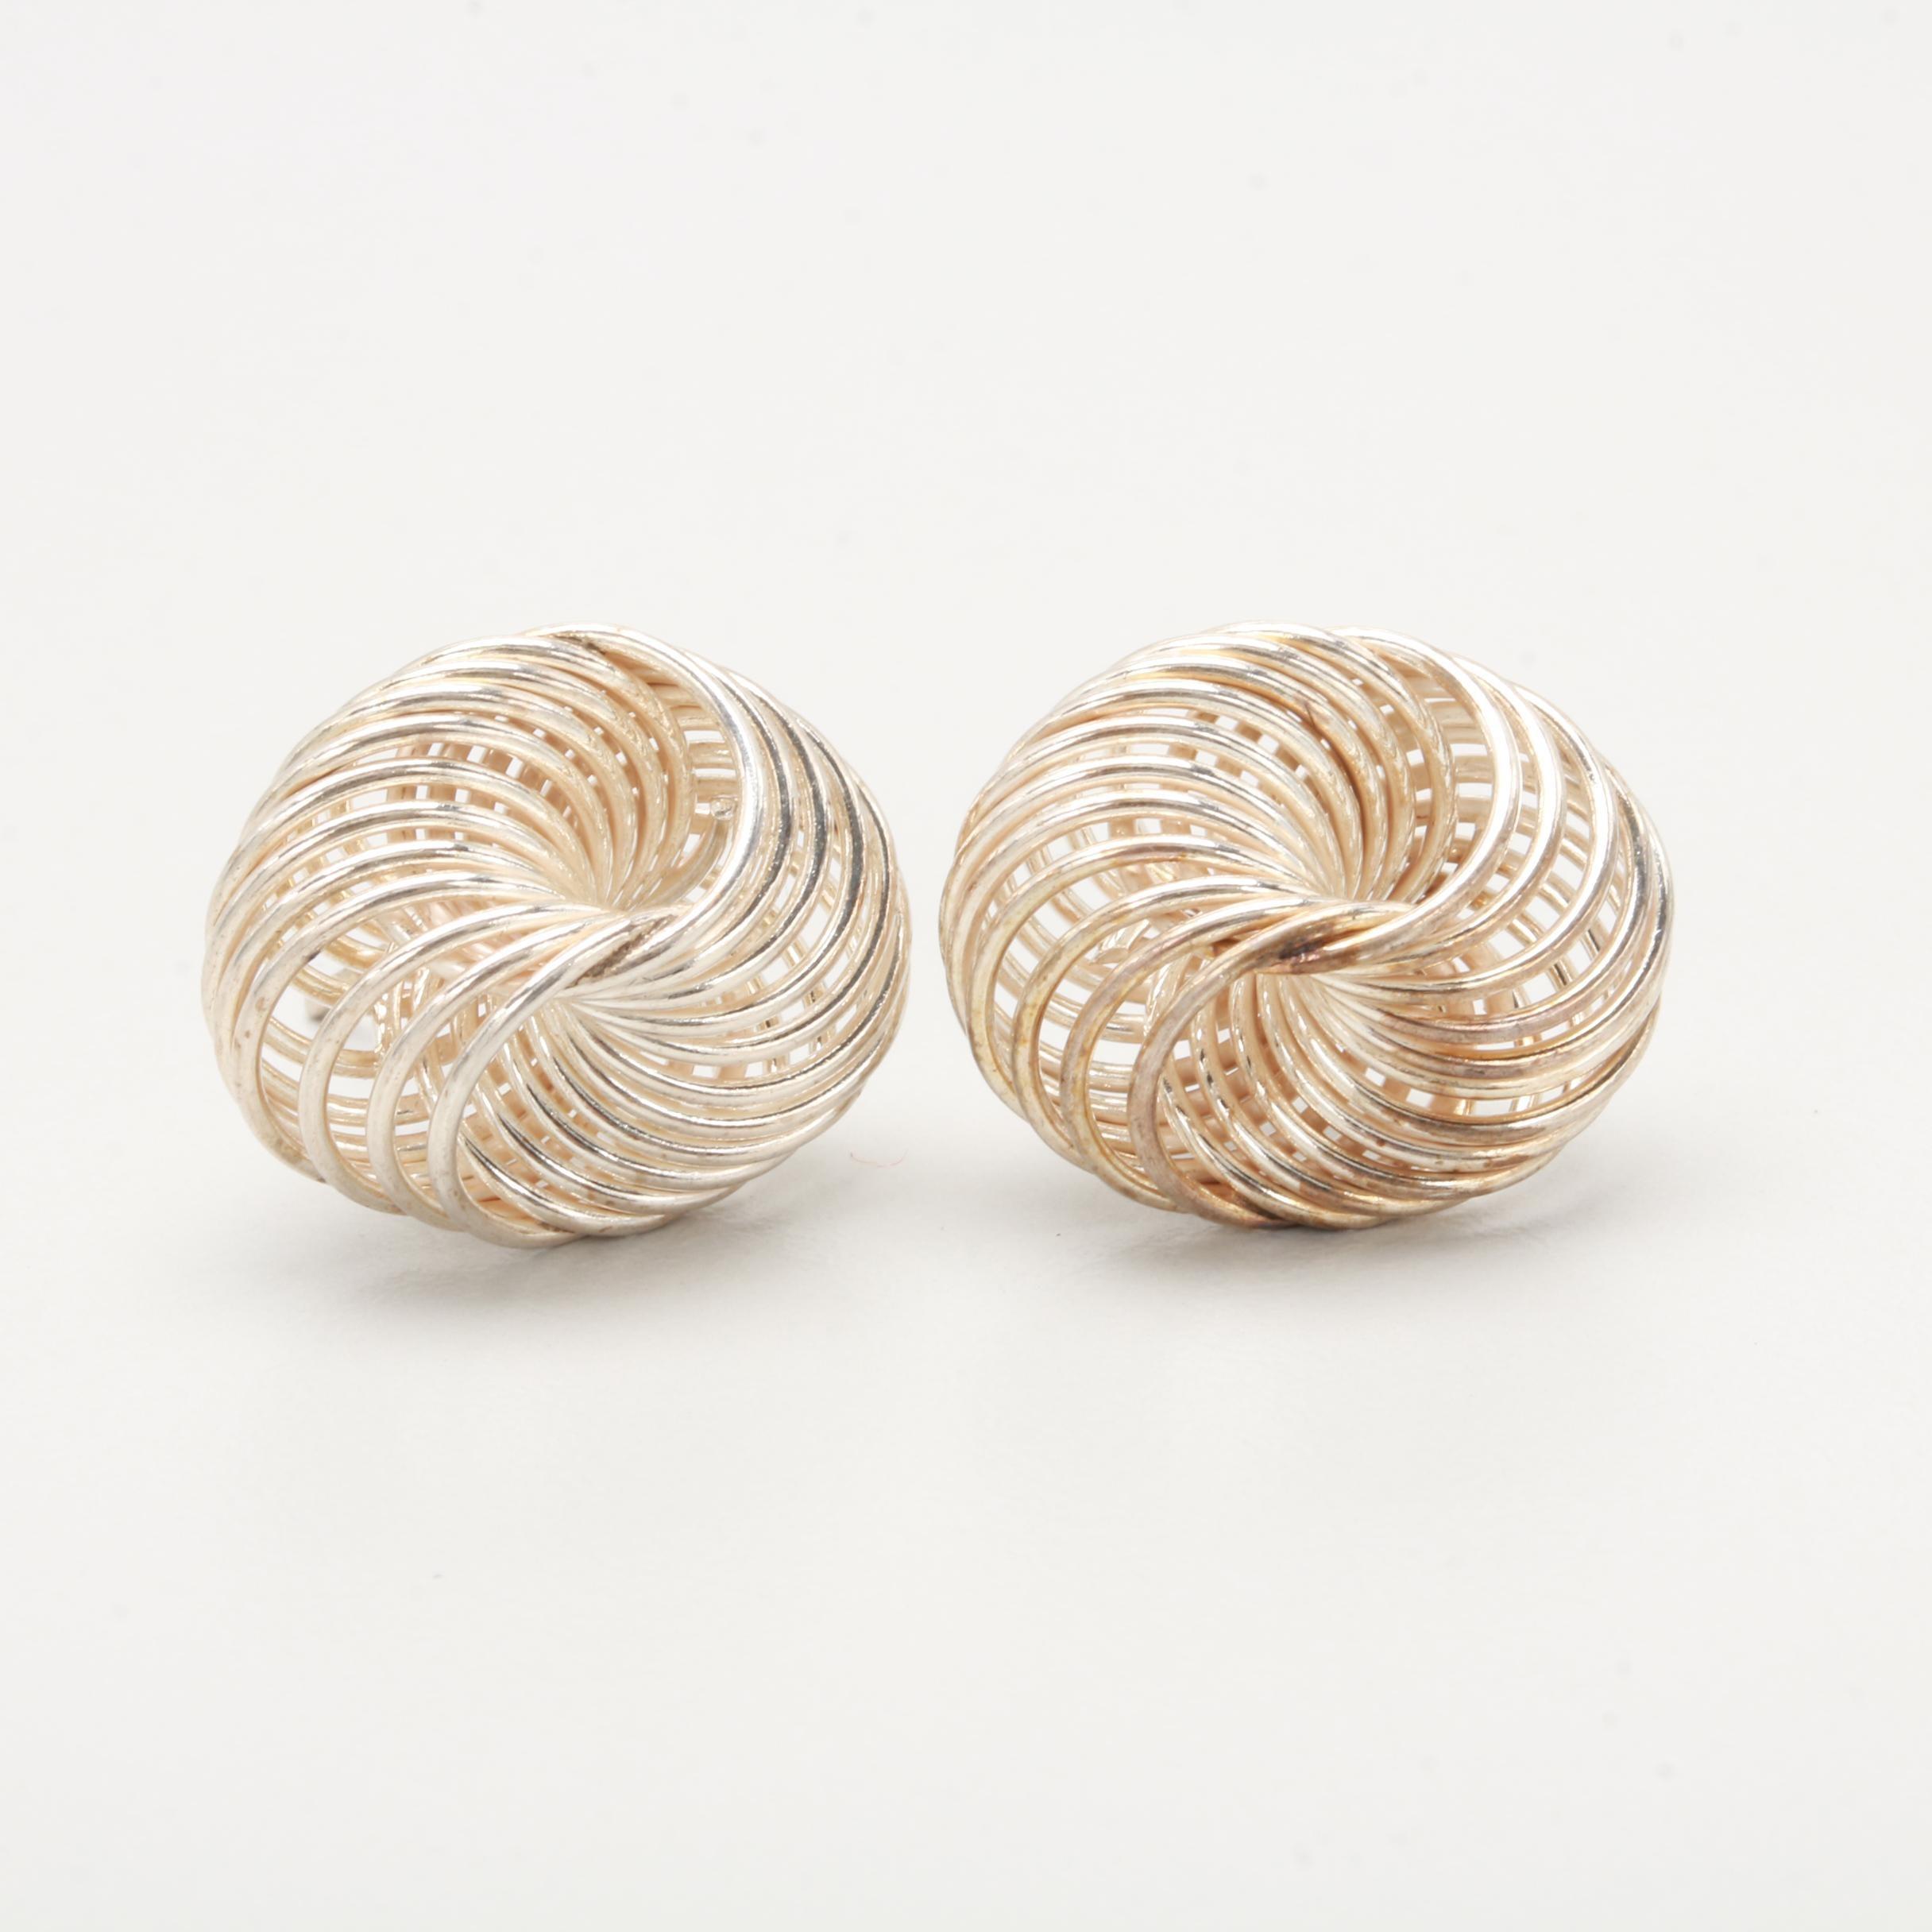 Sterling Silver Undulating Ring Pattern Earrings